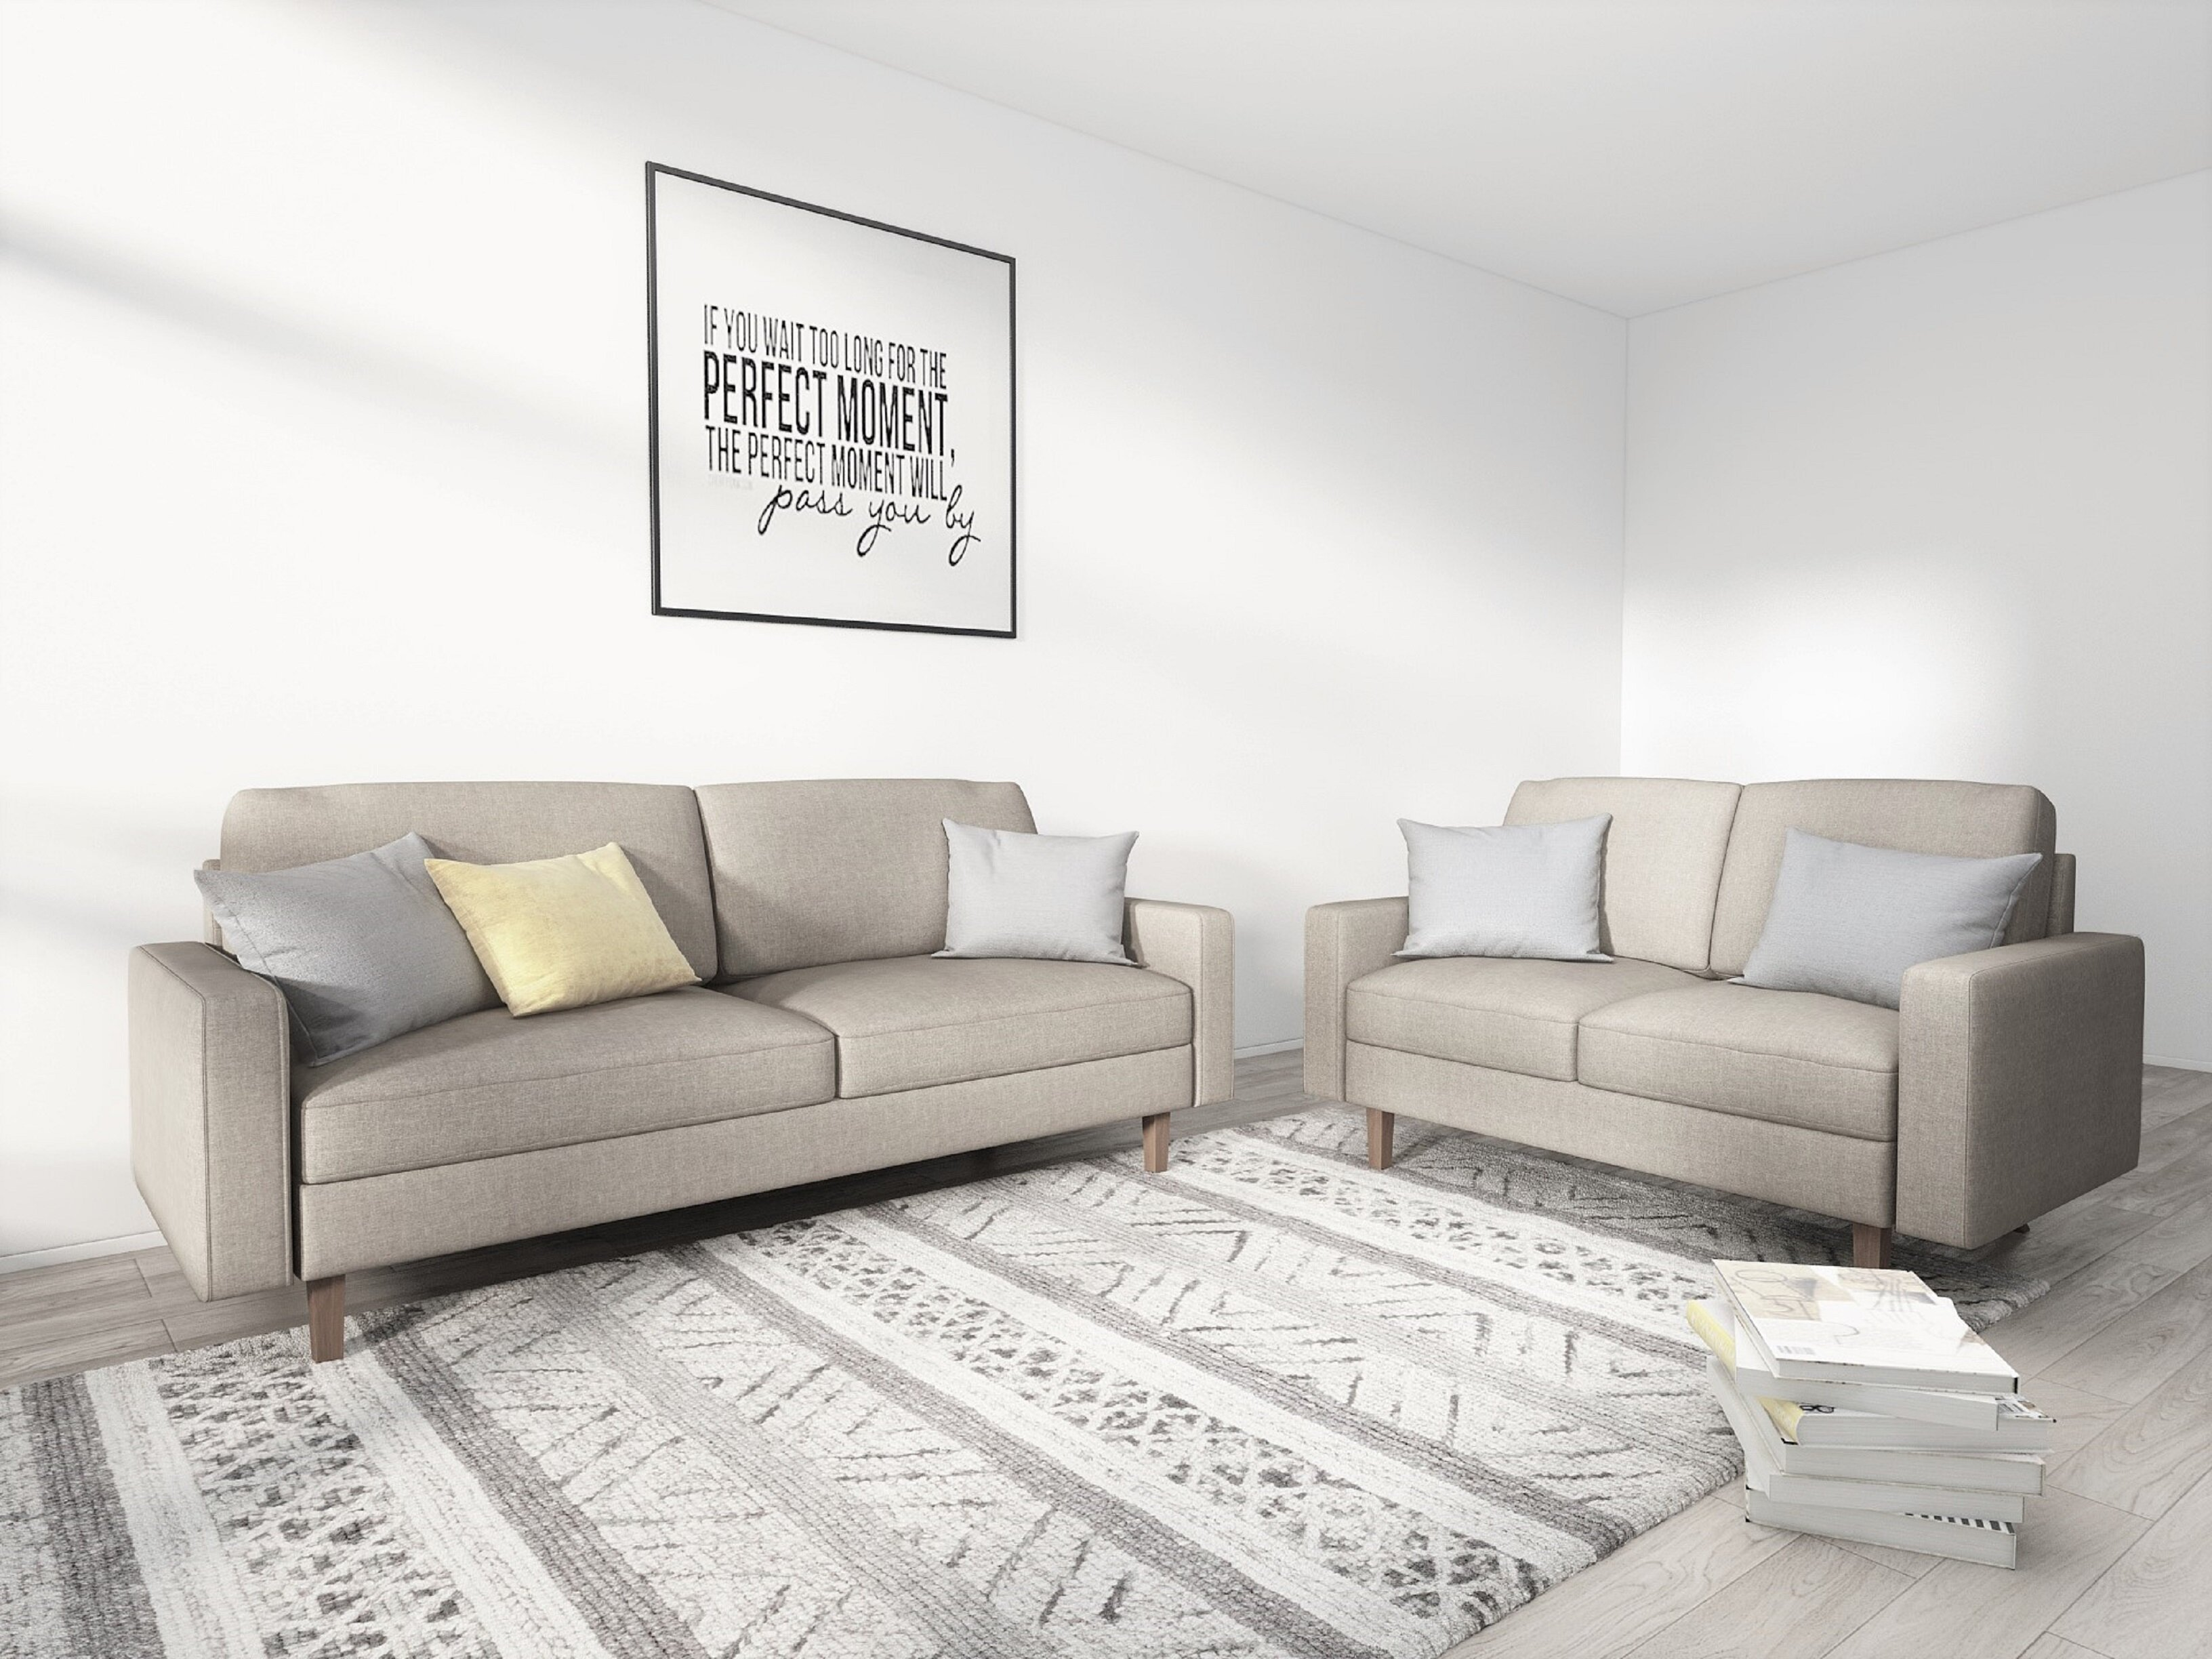 George oliver stephan modern 2 piece living room set wayfair